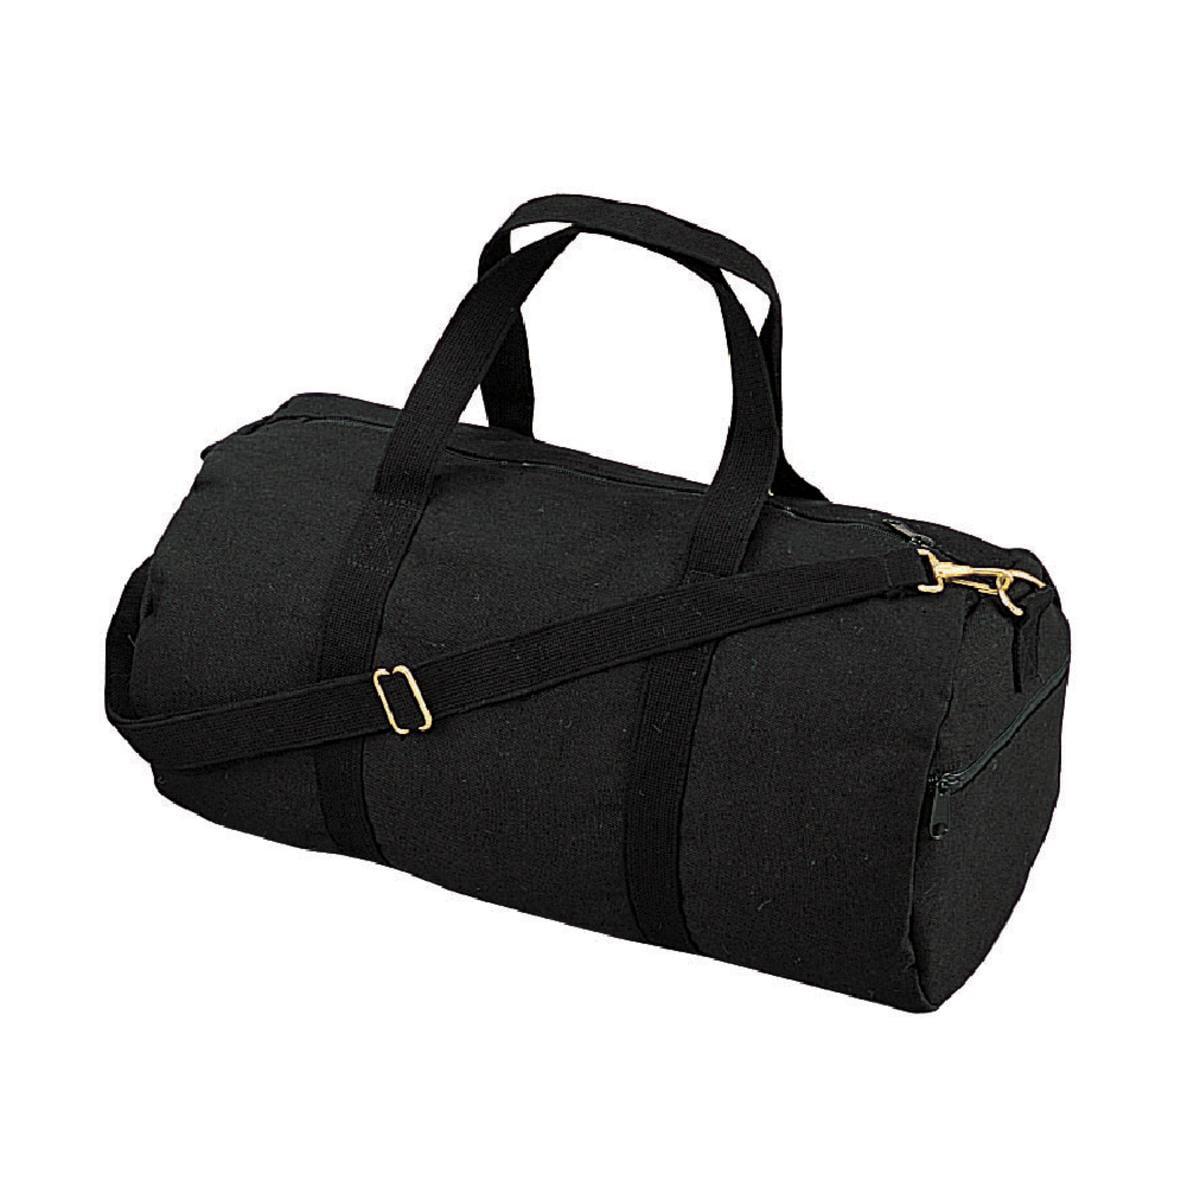 "Rothco 19"" Canvas Shoulder Duffel Bag, Sports Duffle Bag by Rothco"